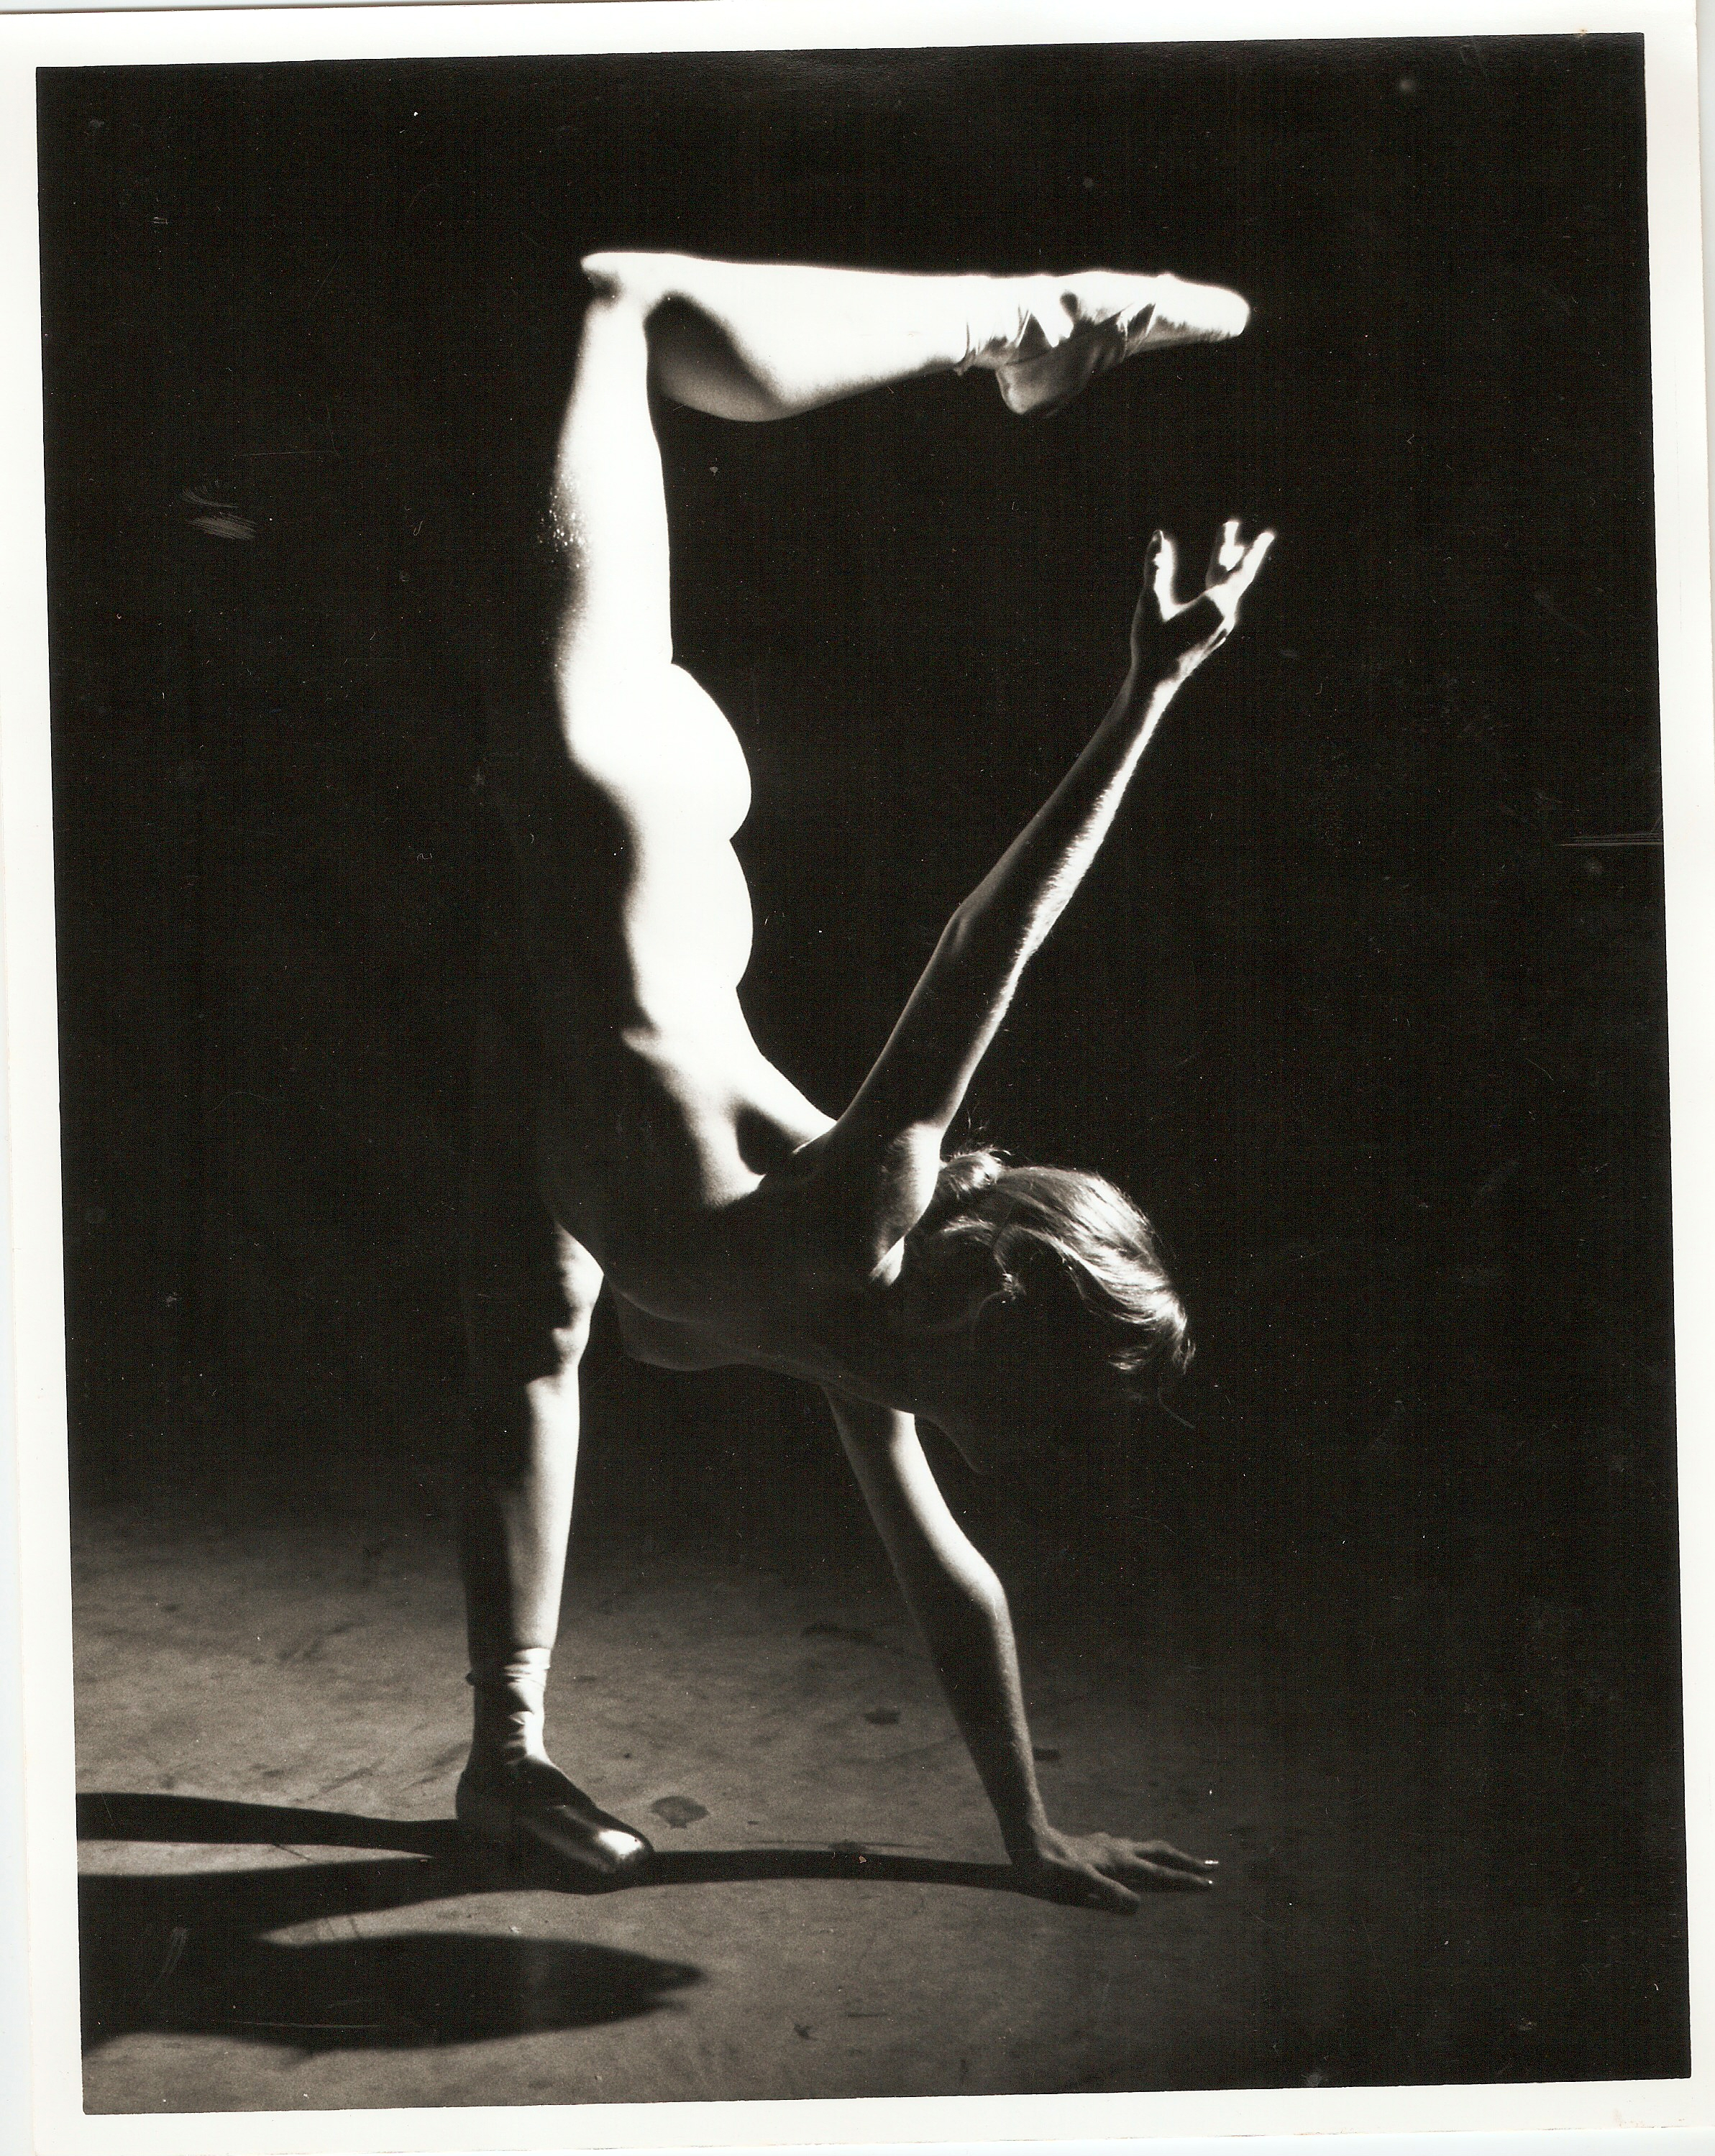 Loren Ellis Ballet  in Fla. Painting Studio 2 of 3 8x10 1979.jpg